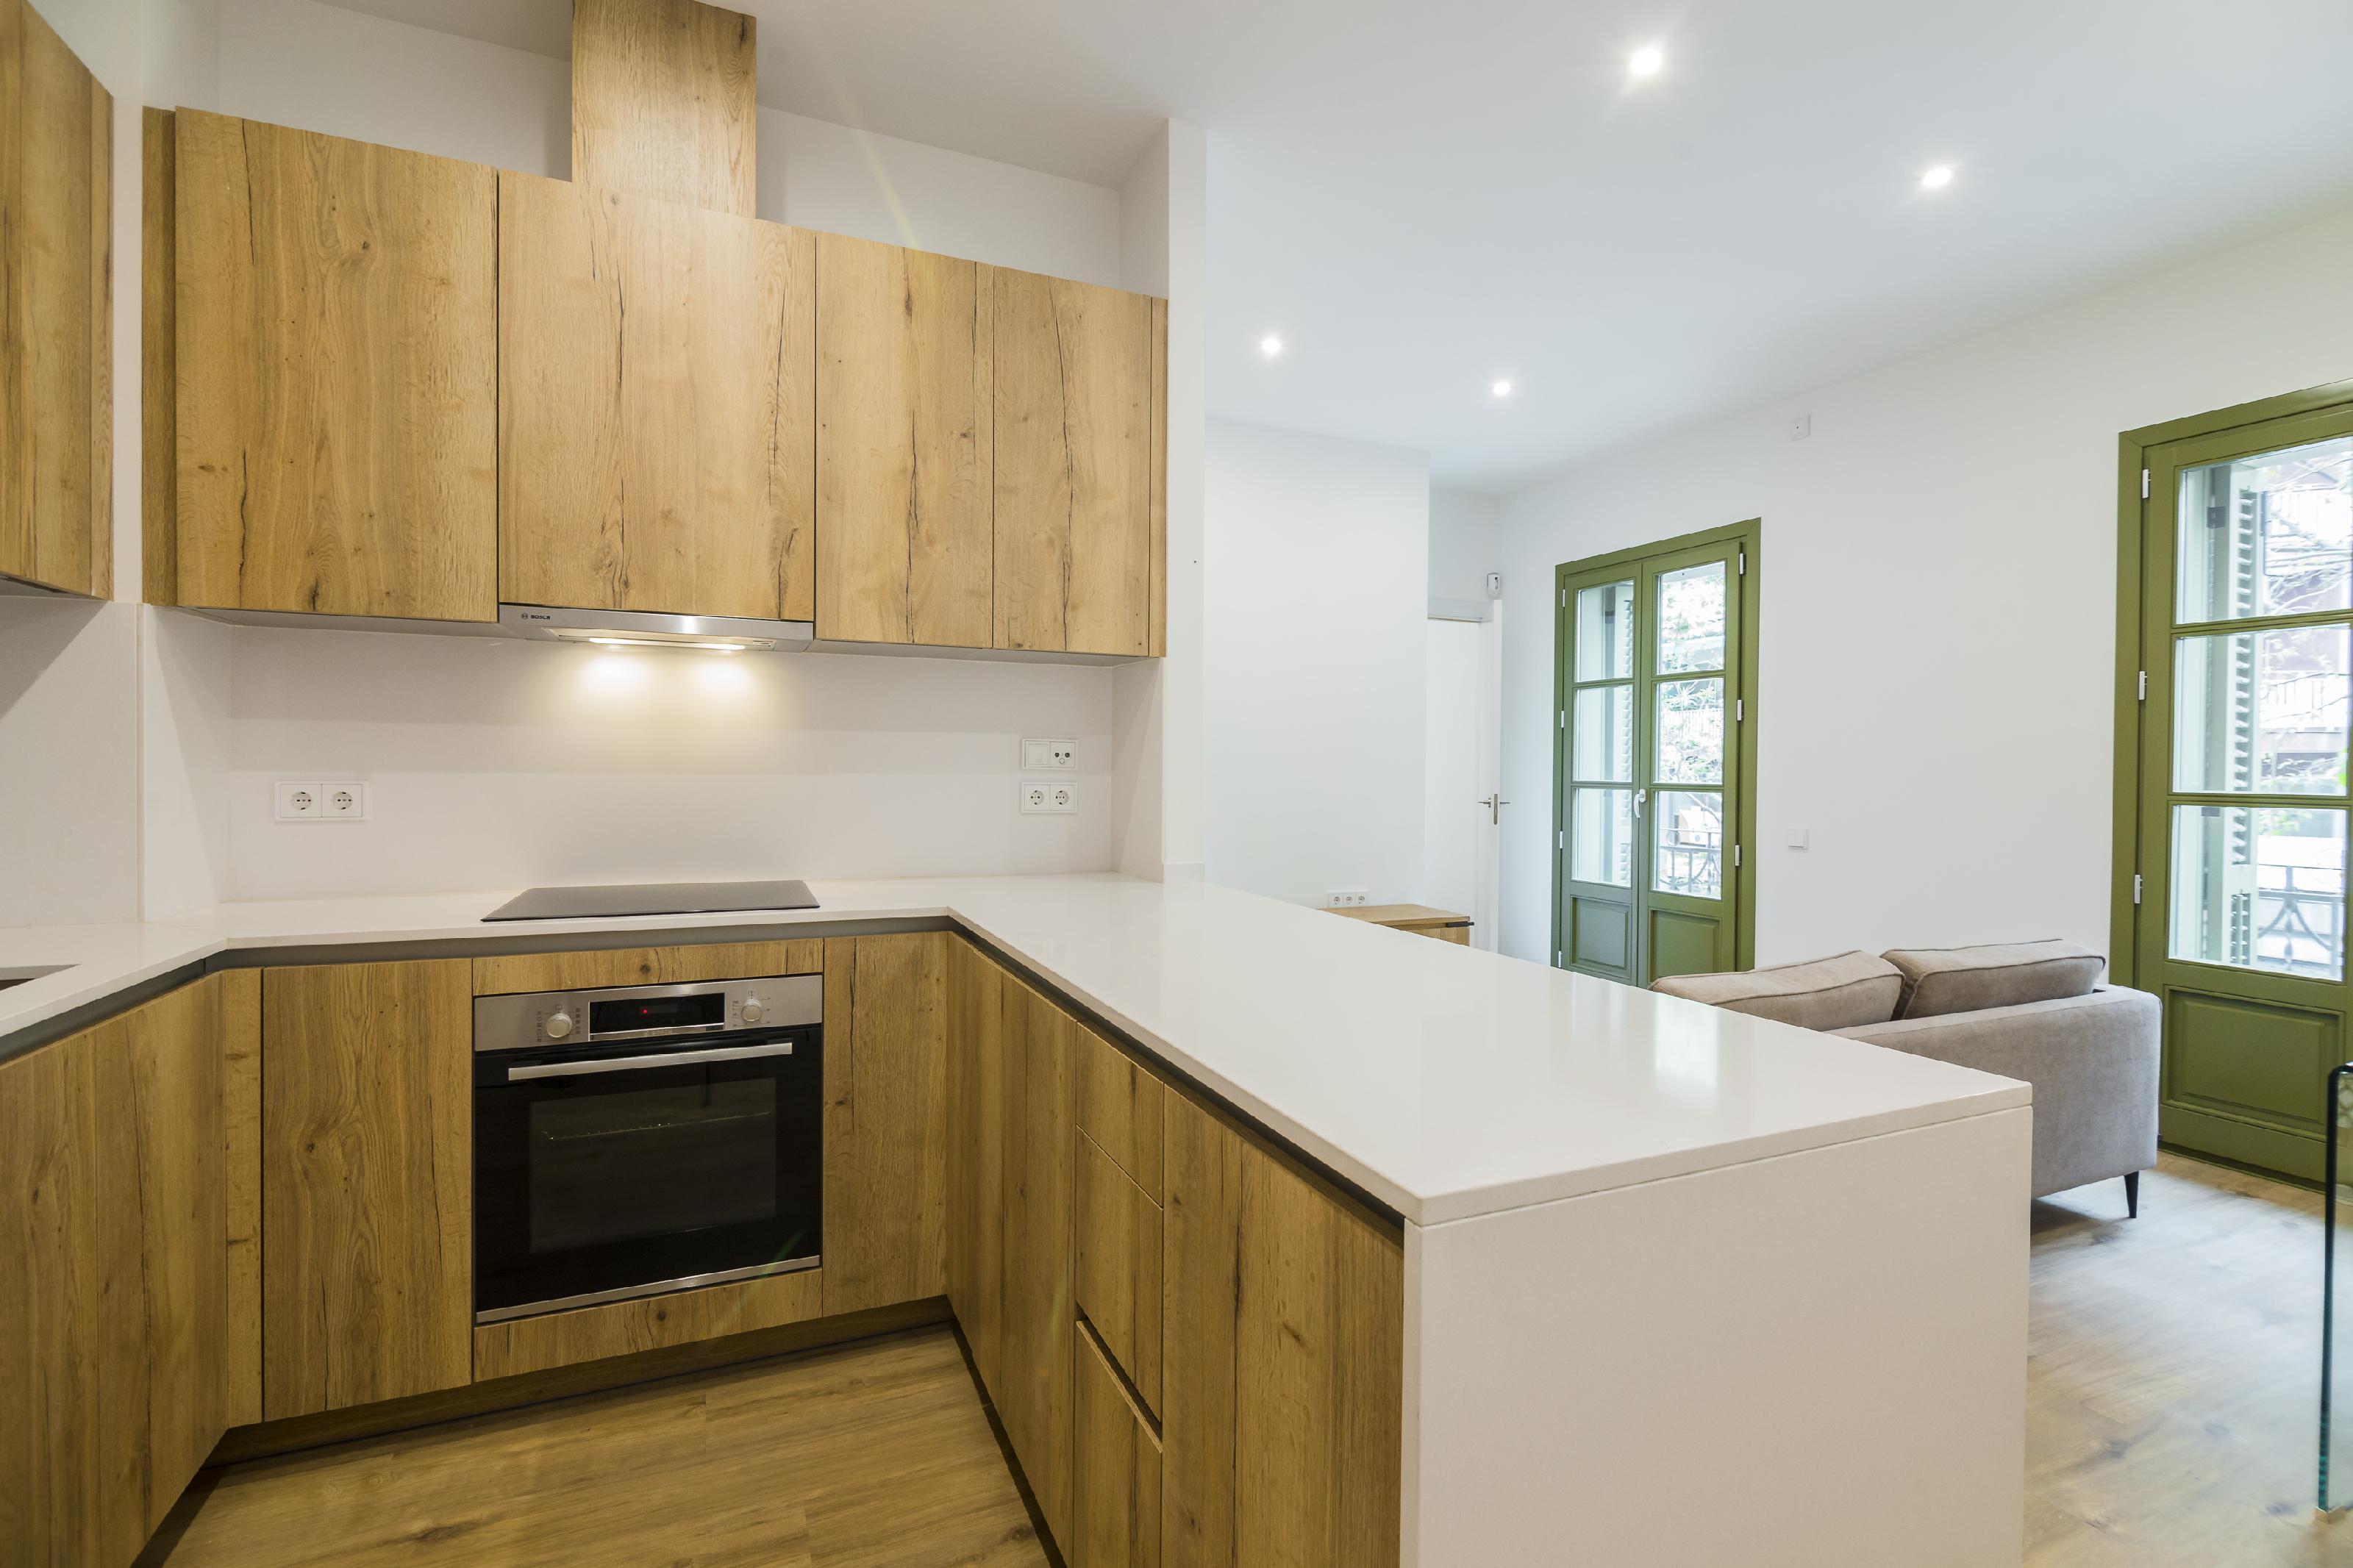 249266 Flat for sale in Eixample, Nova Esquerra Eixample 5